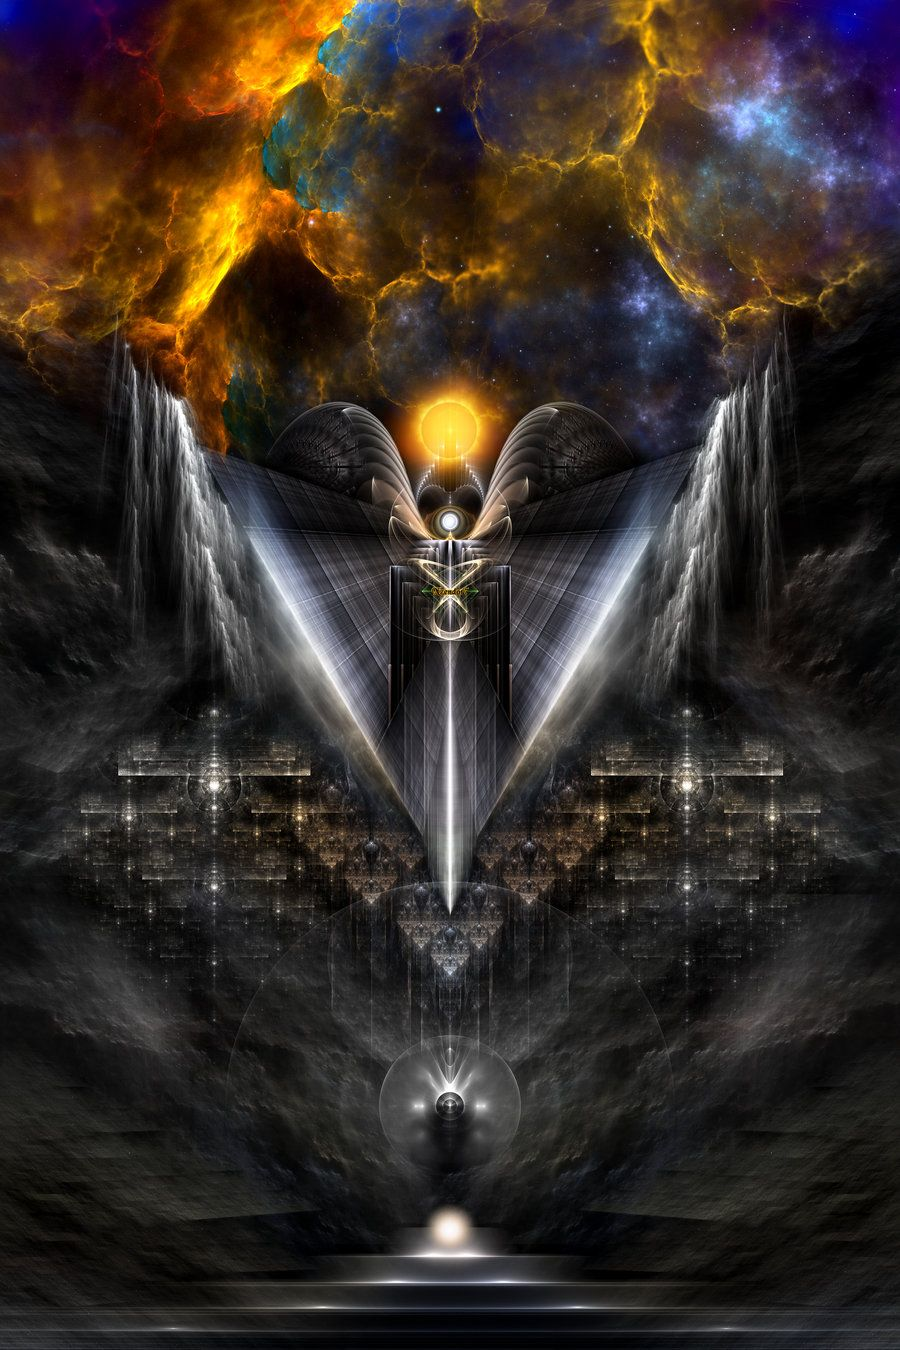 Esfantelinous (The Realm Dreams) by xzendor7.deviantart.com on @DeviantArt